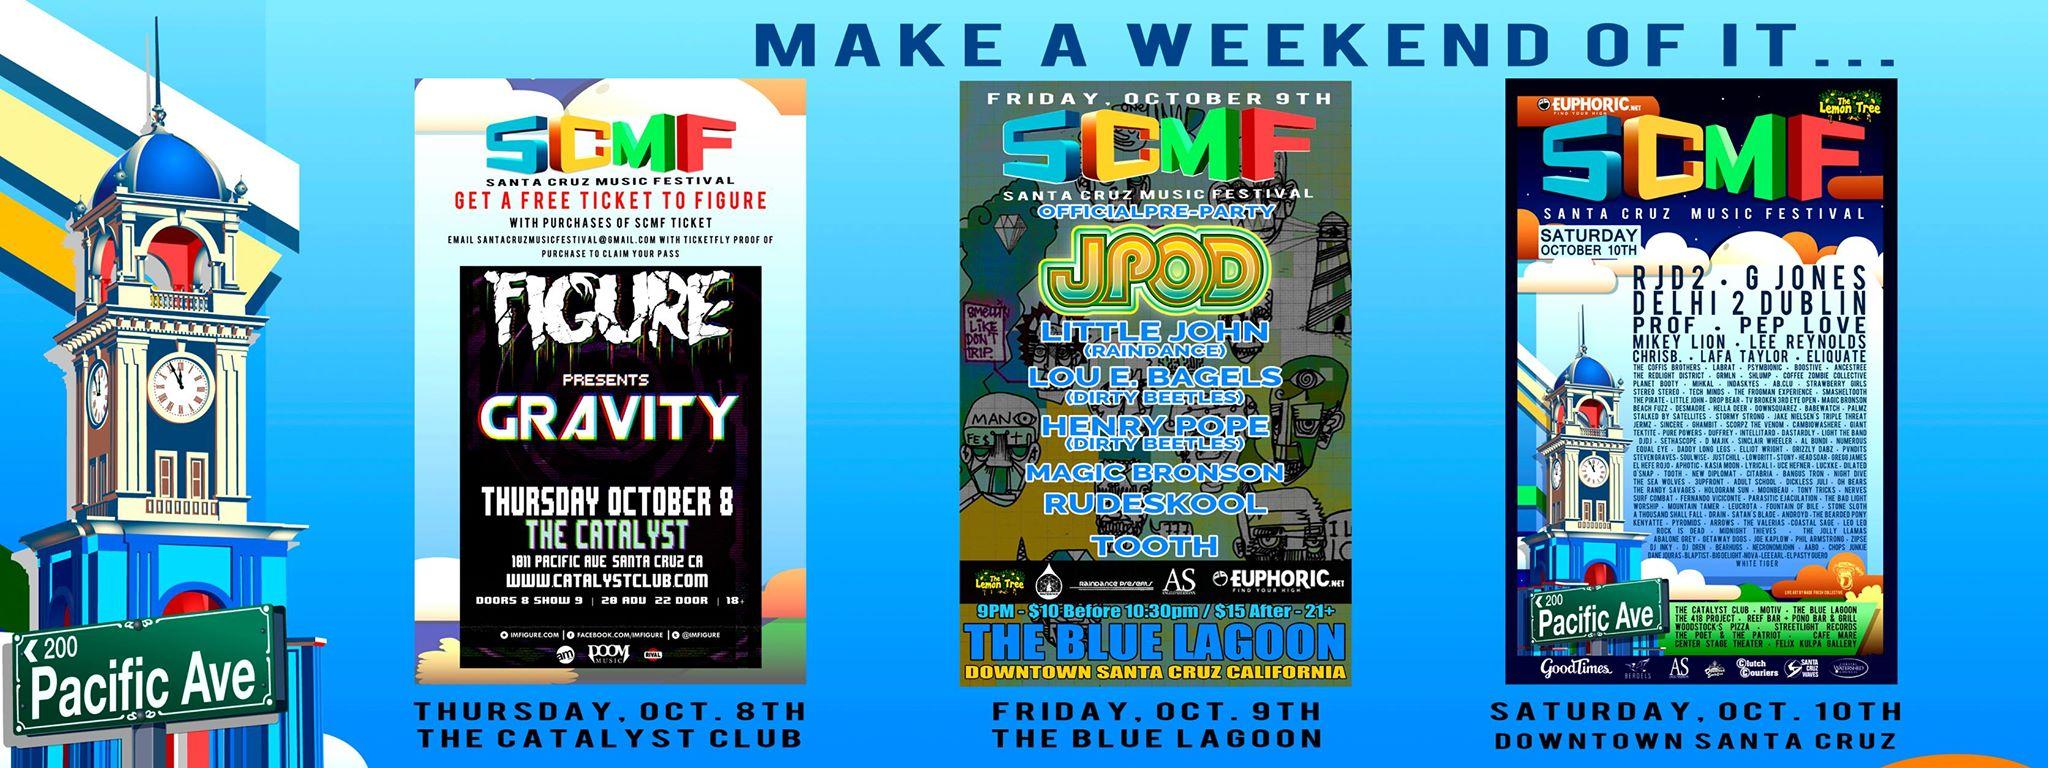 Santa Cruz Music Festival  (Santa Cruz, Ca.)